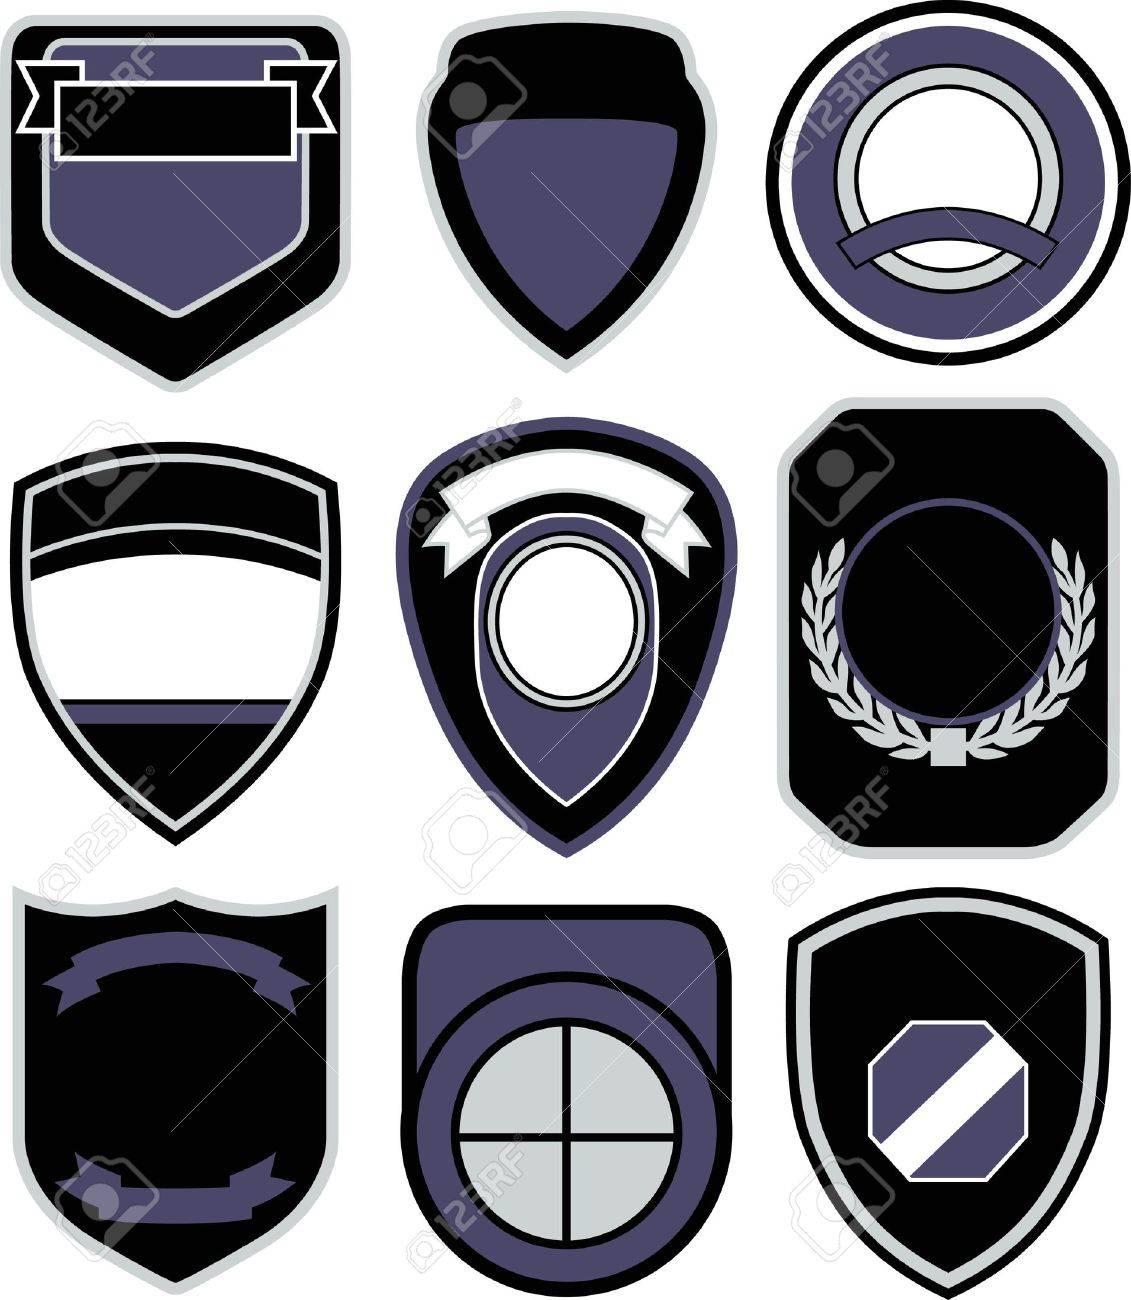 emblem badge shield design royalty free cliparts vectors and